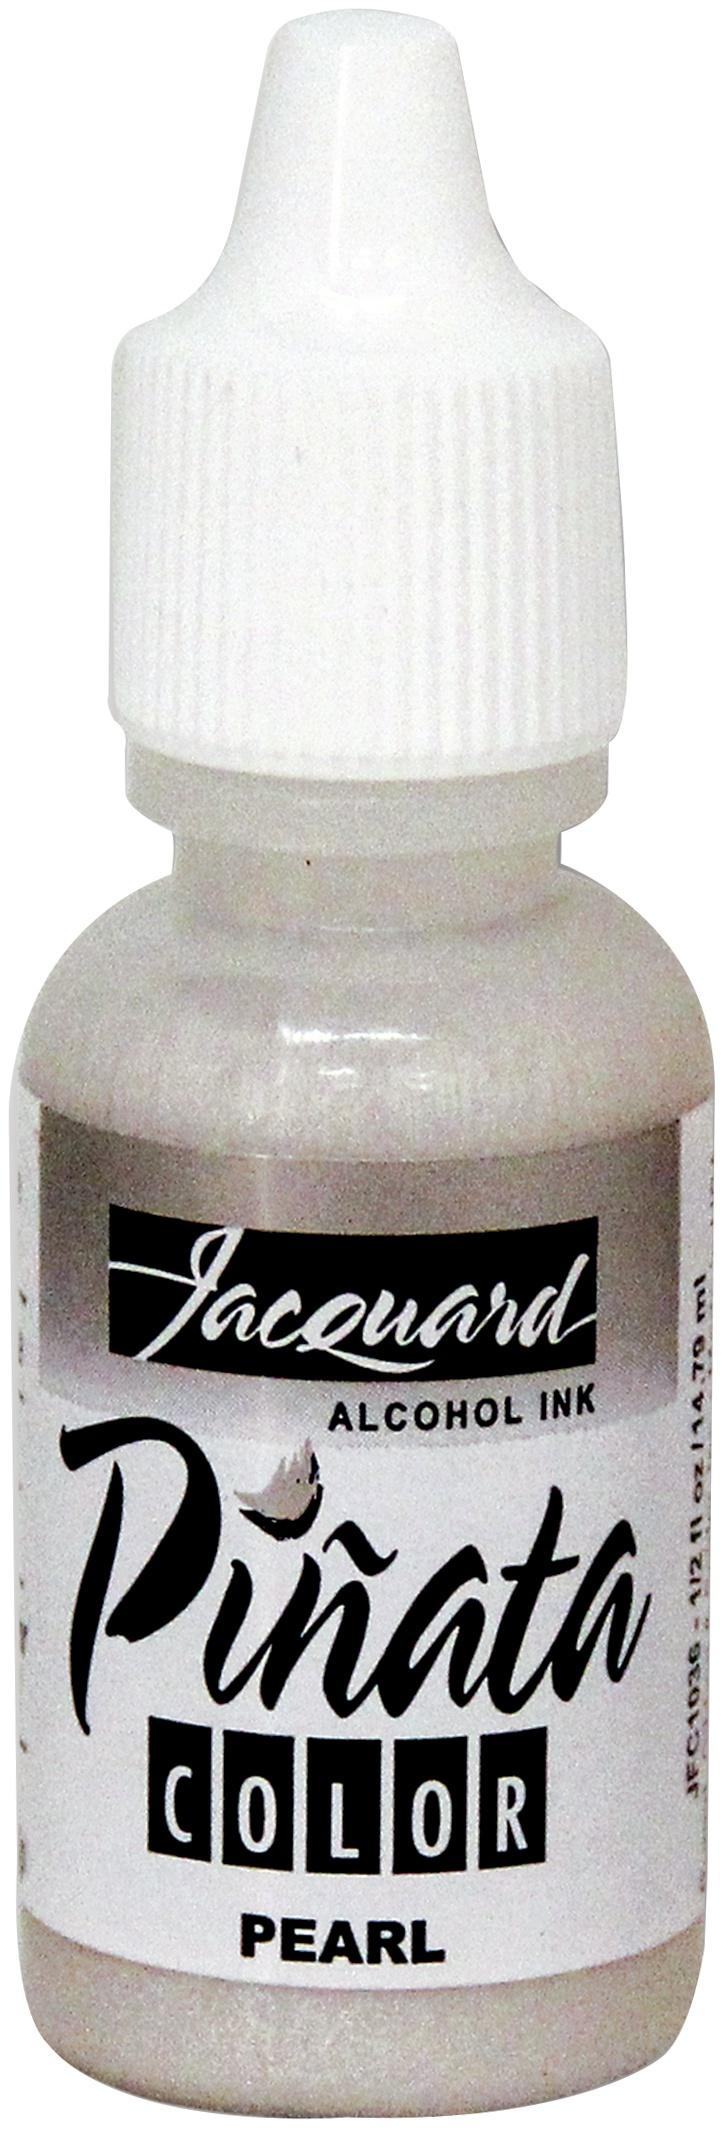 Jacquard Pinata Color Alcohol Ink .5oz-Pearl